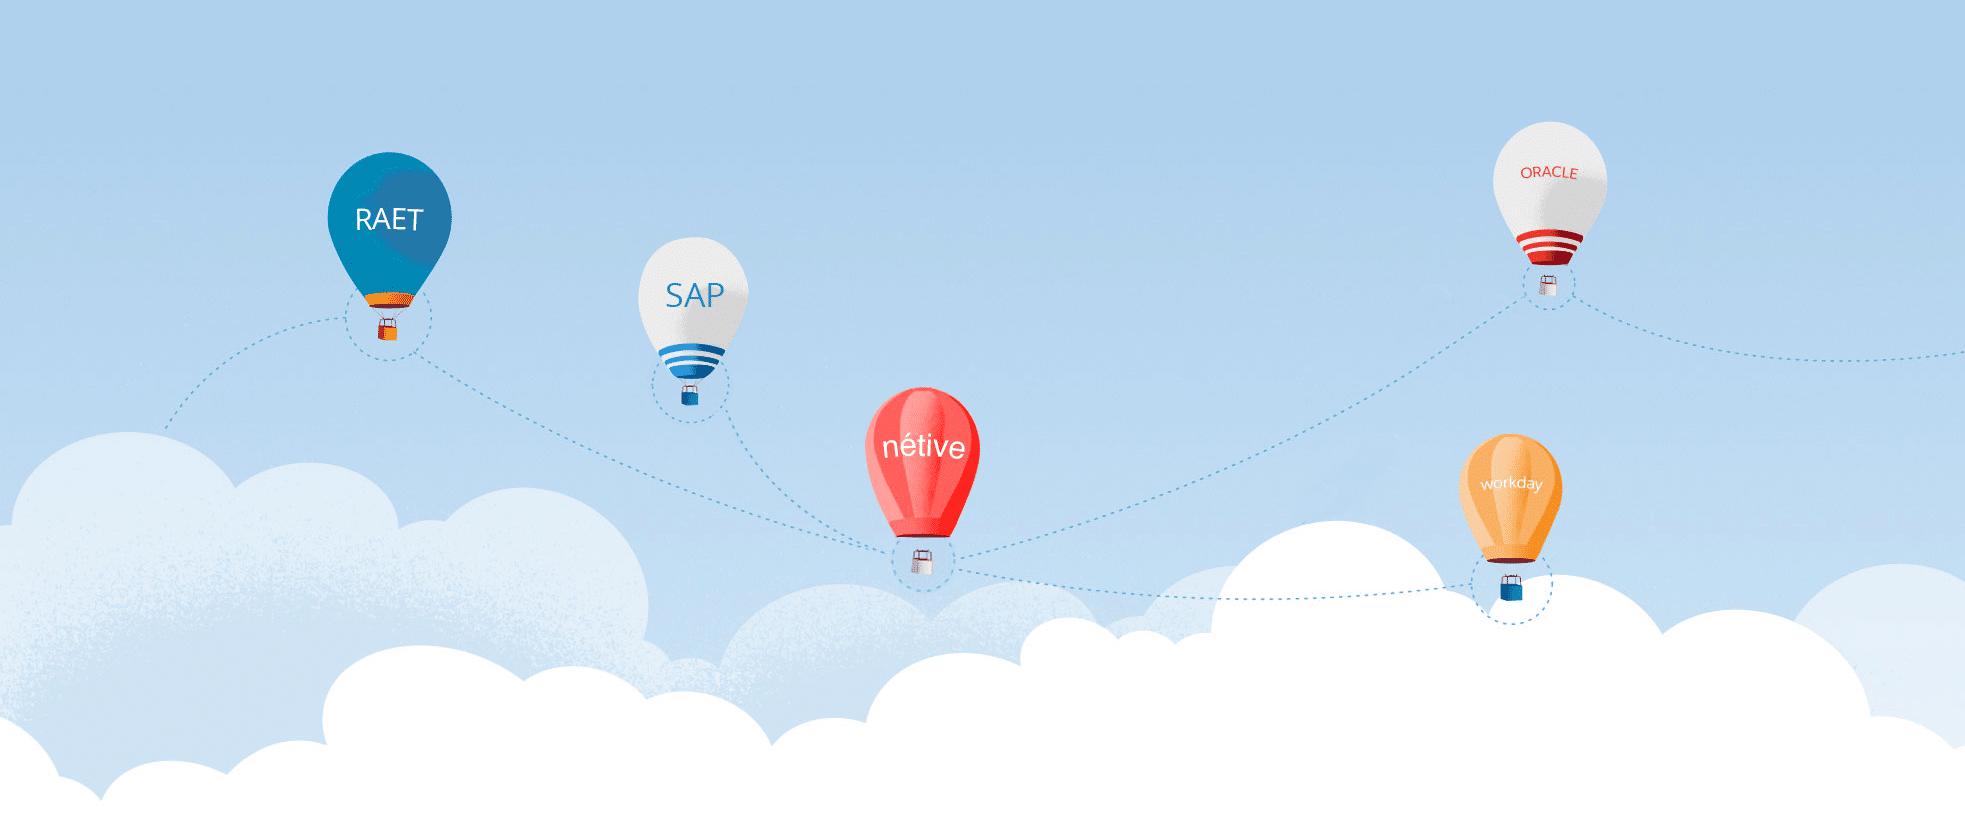 Netive VMS API